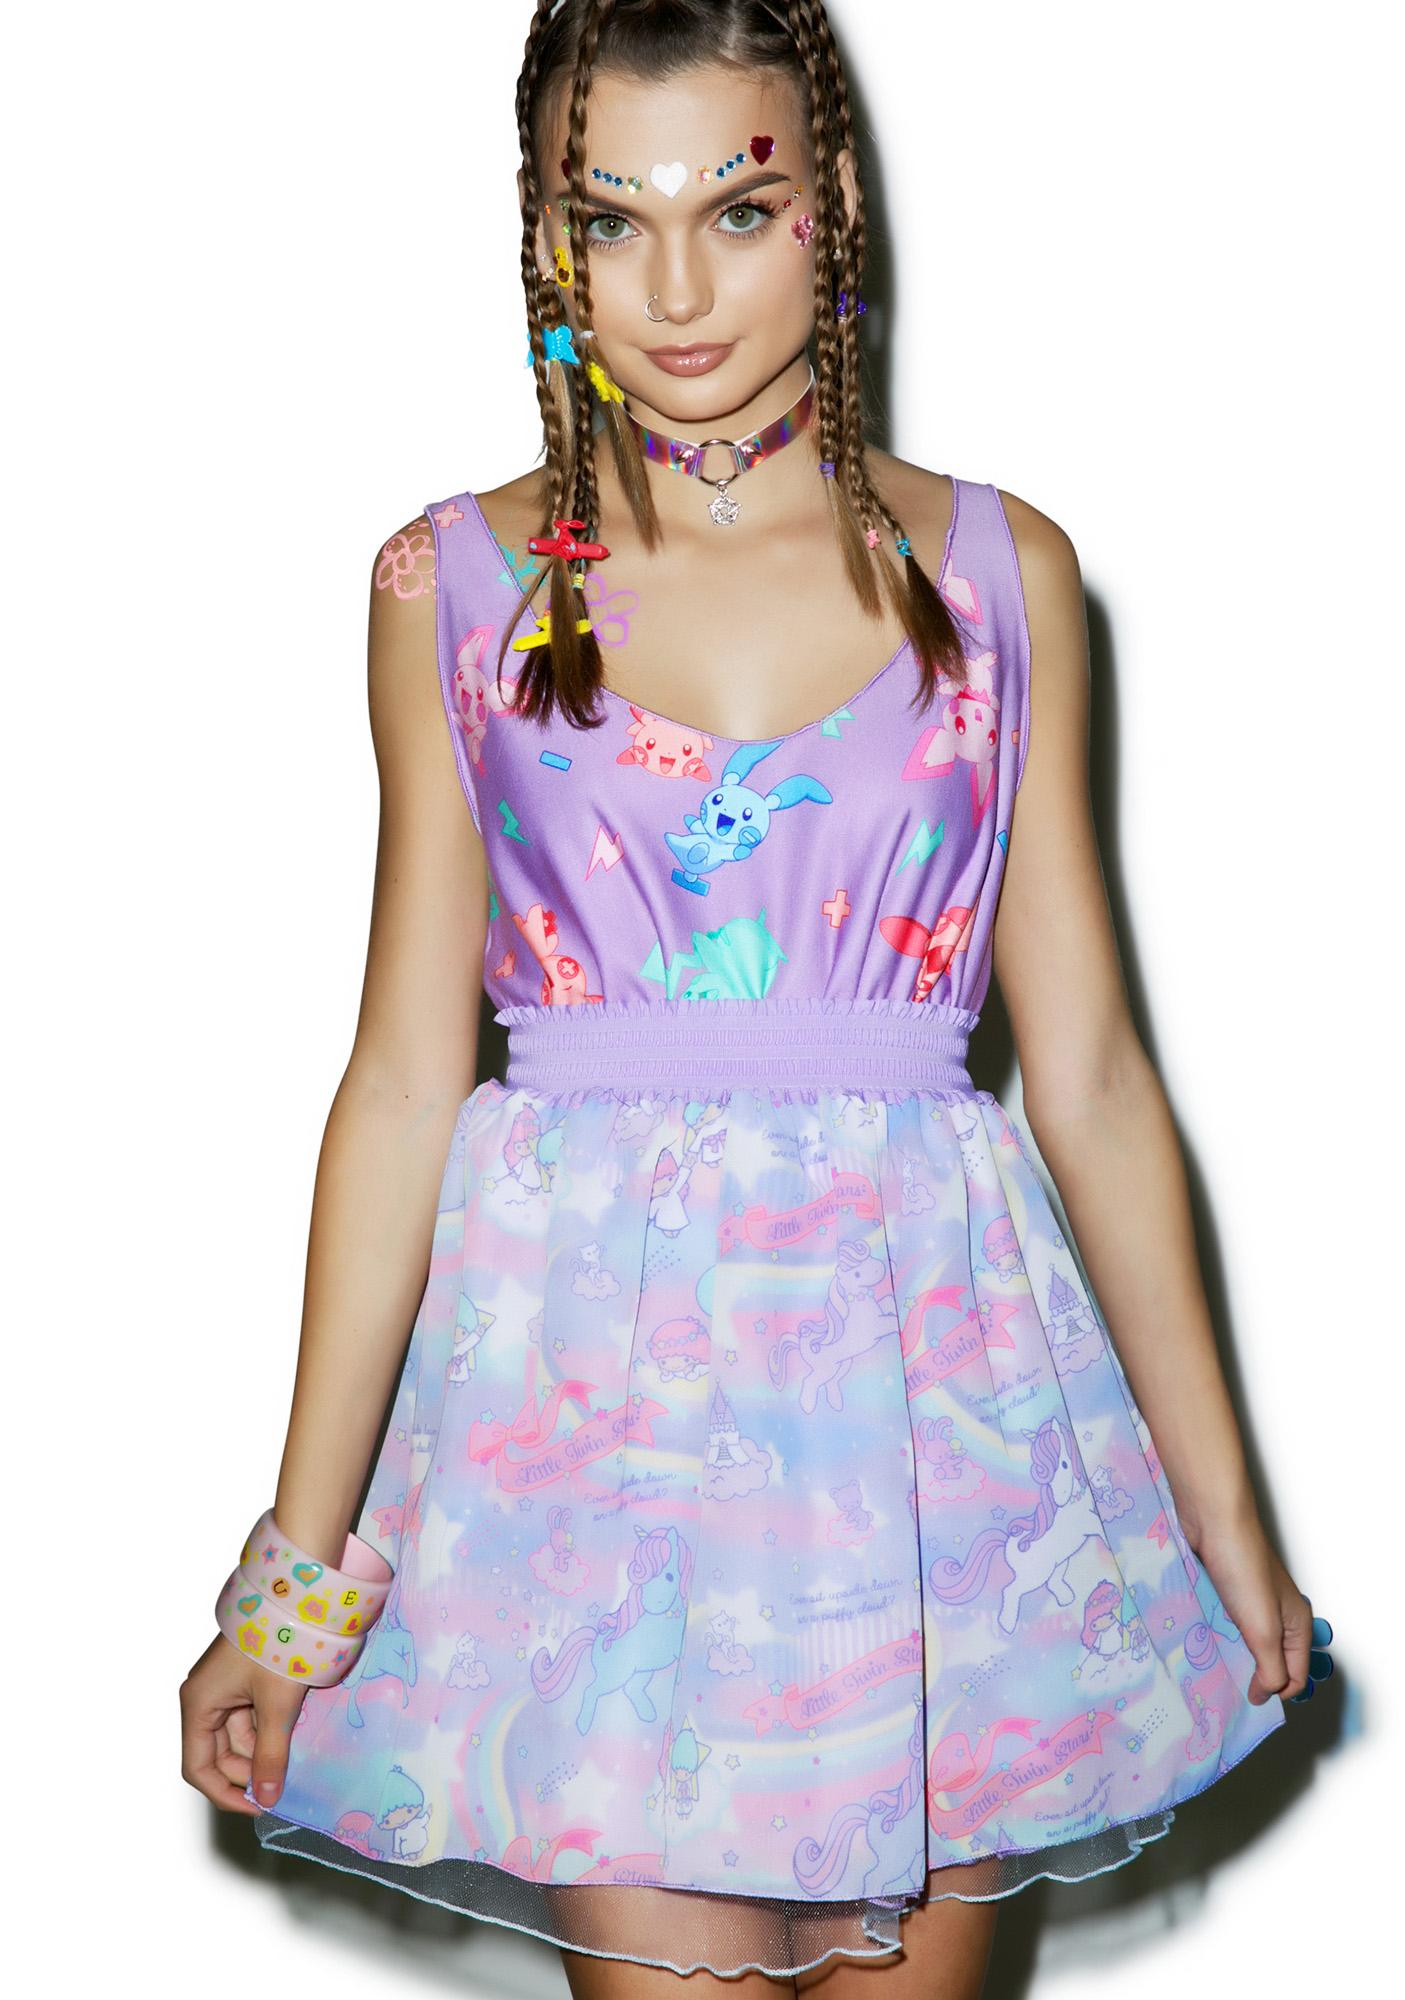 Japan L.A. Little Twin Stars Dreamy Unicorn Tulle Skirt